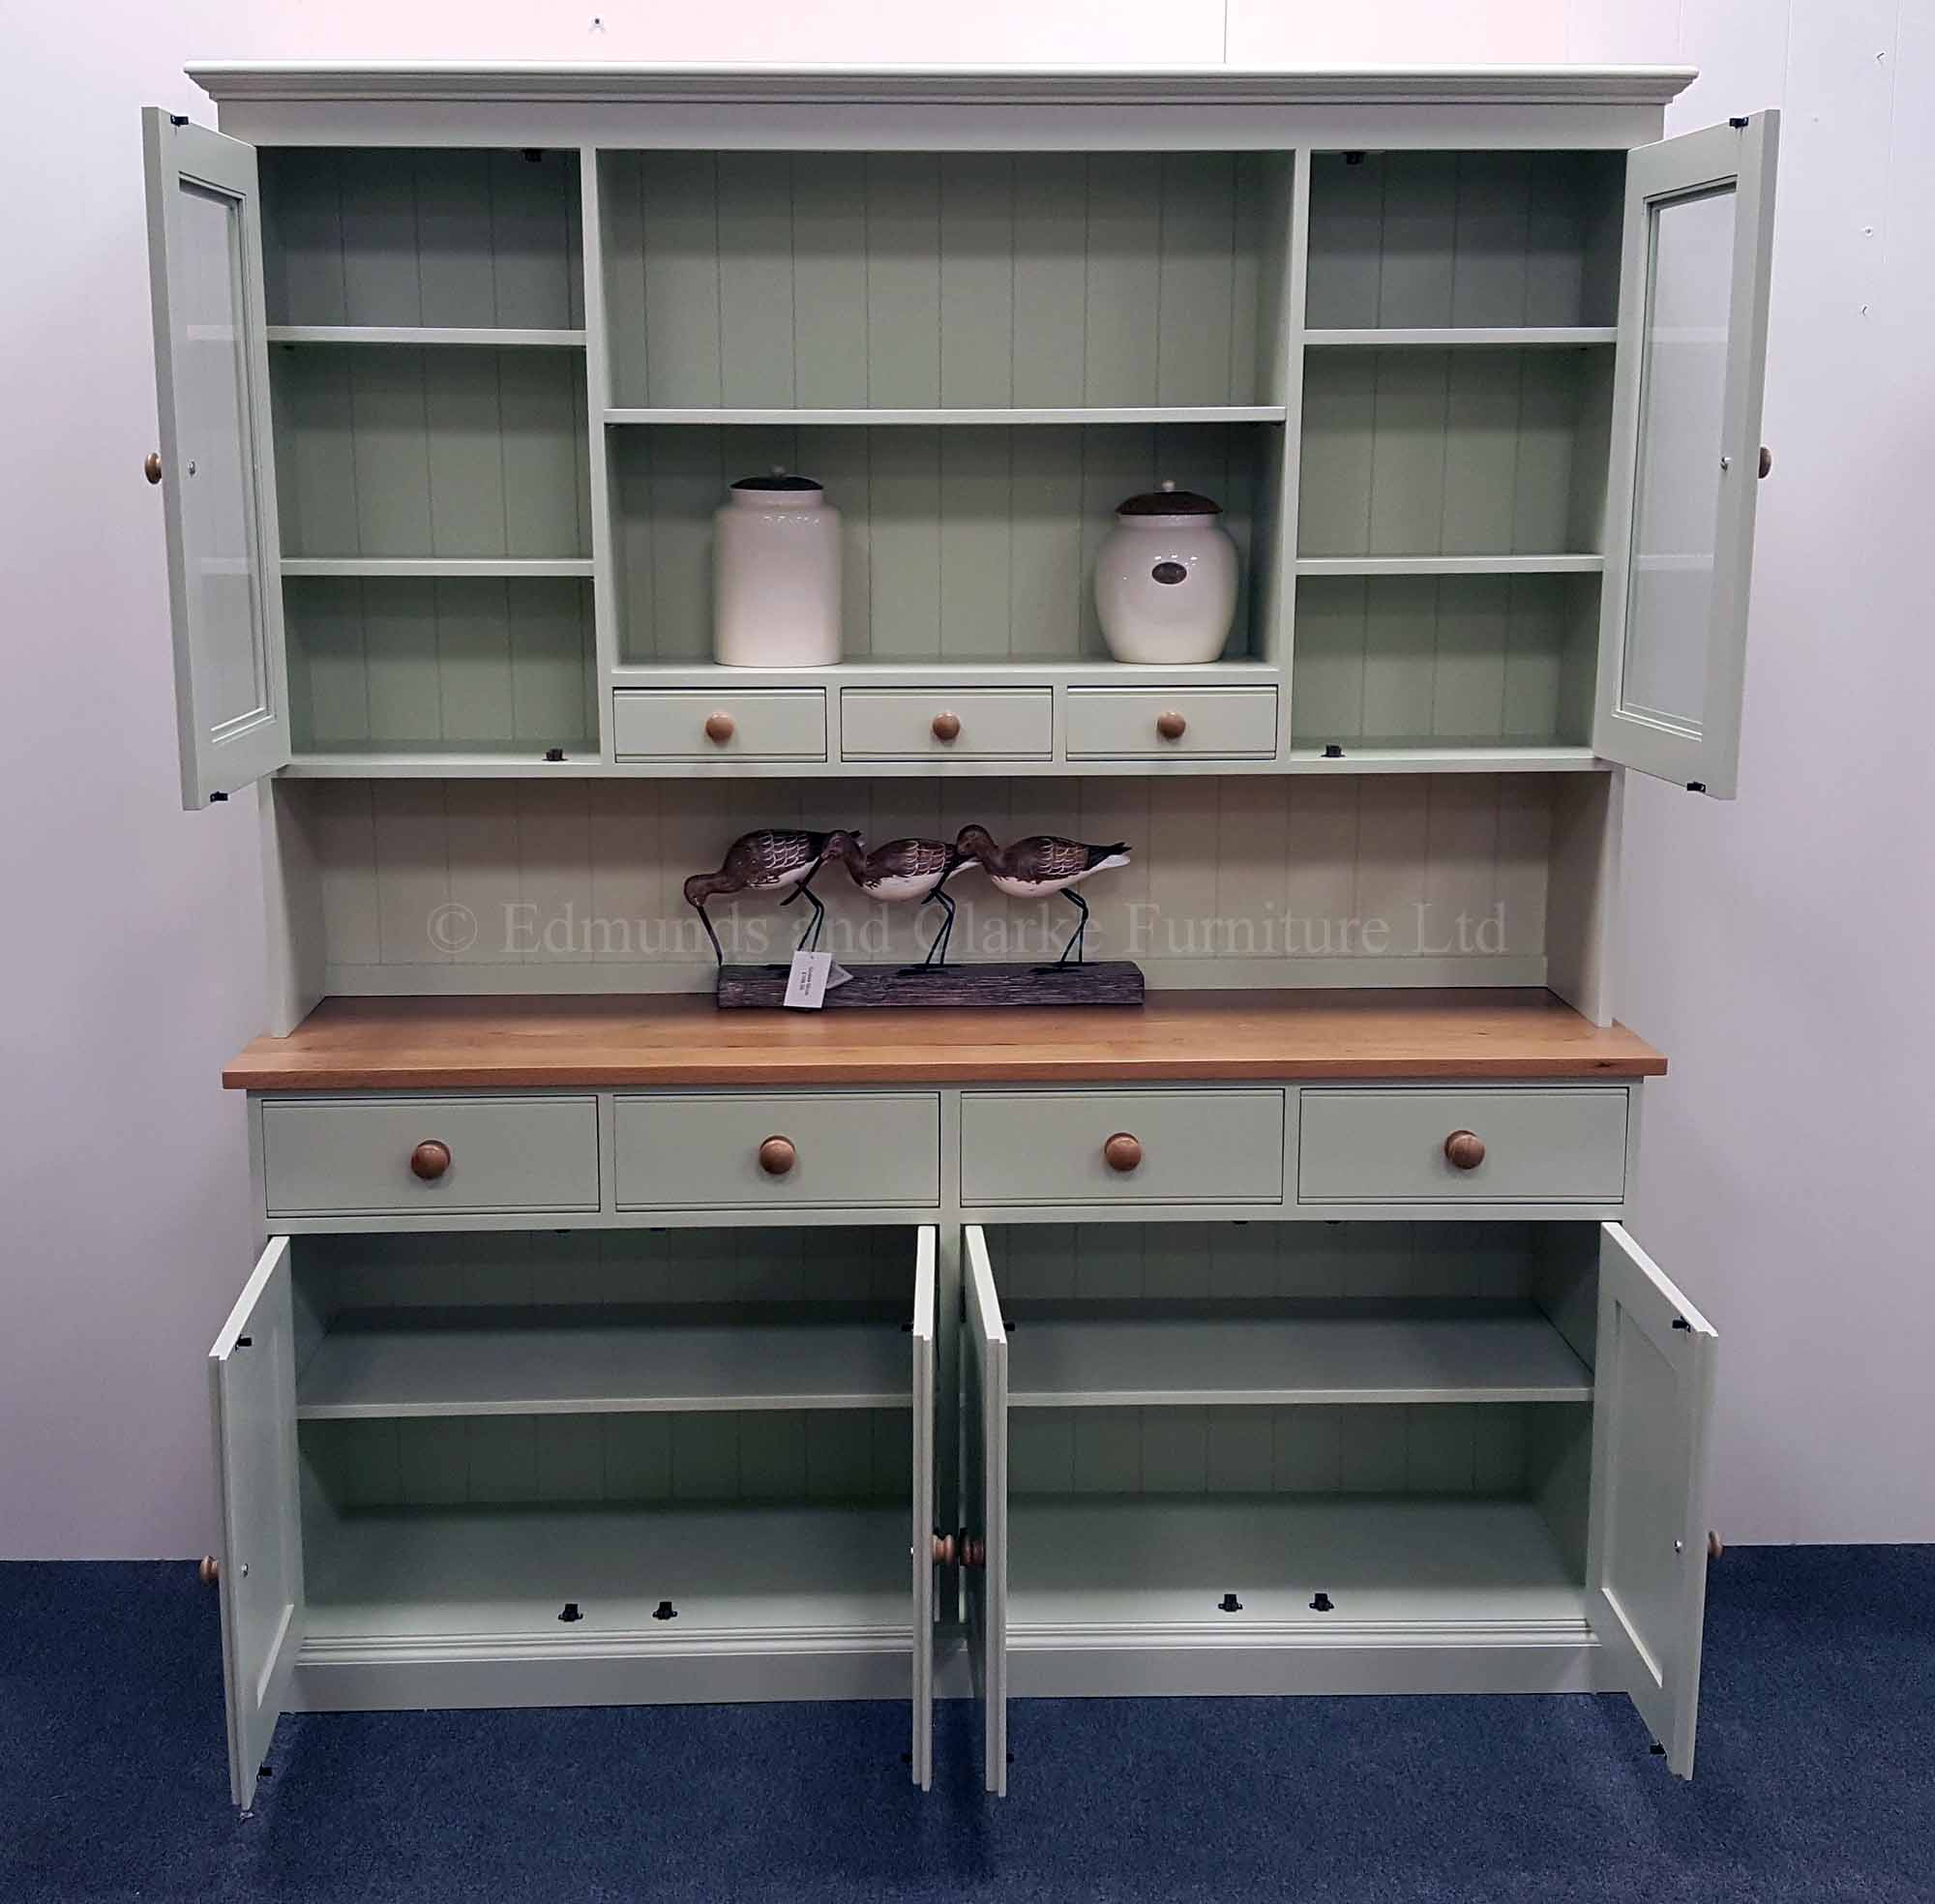 Edmunds painted kitchen dresser oak tops and knobs